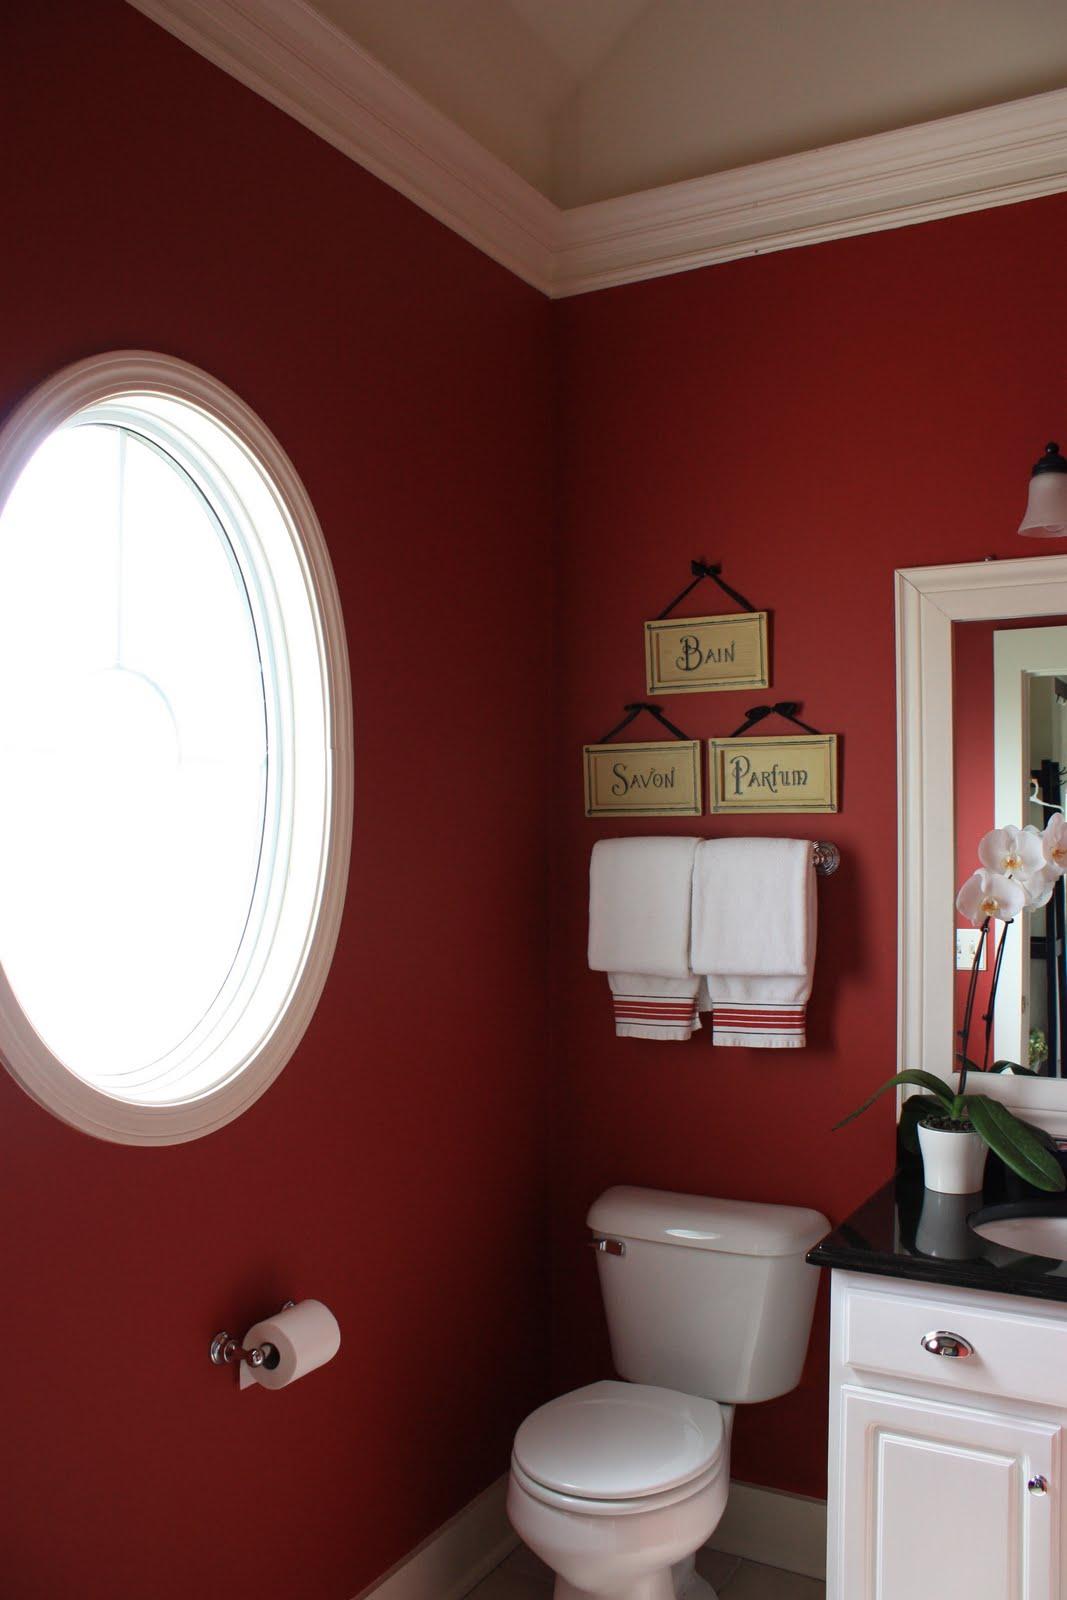 The Yellow Cape Cod Builder Grade Bathroom Gets A Custom Look